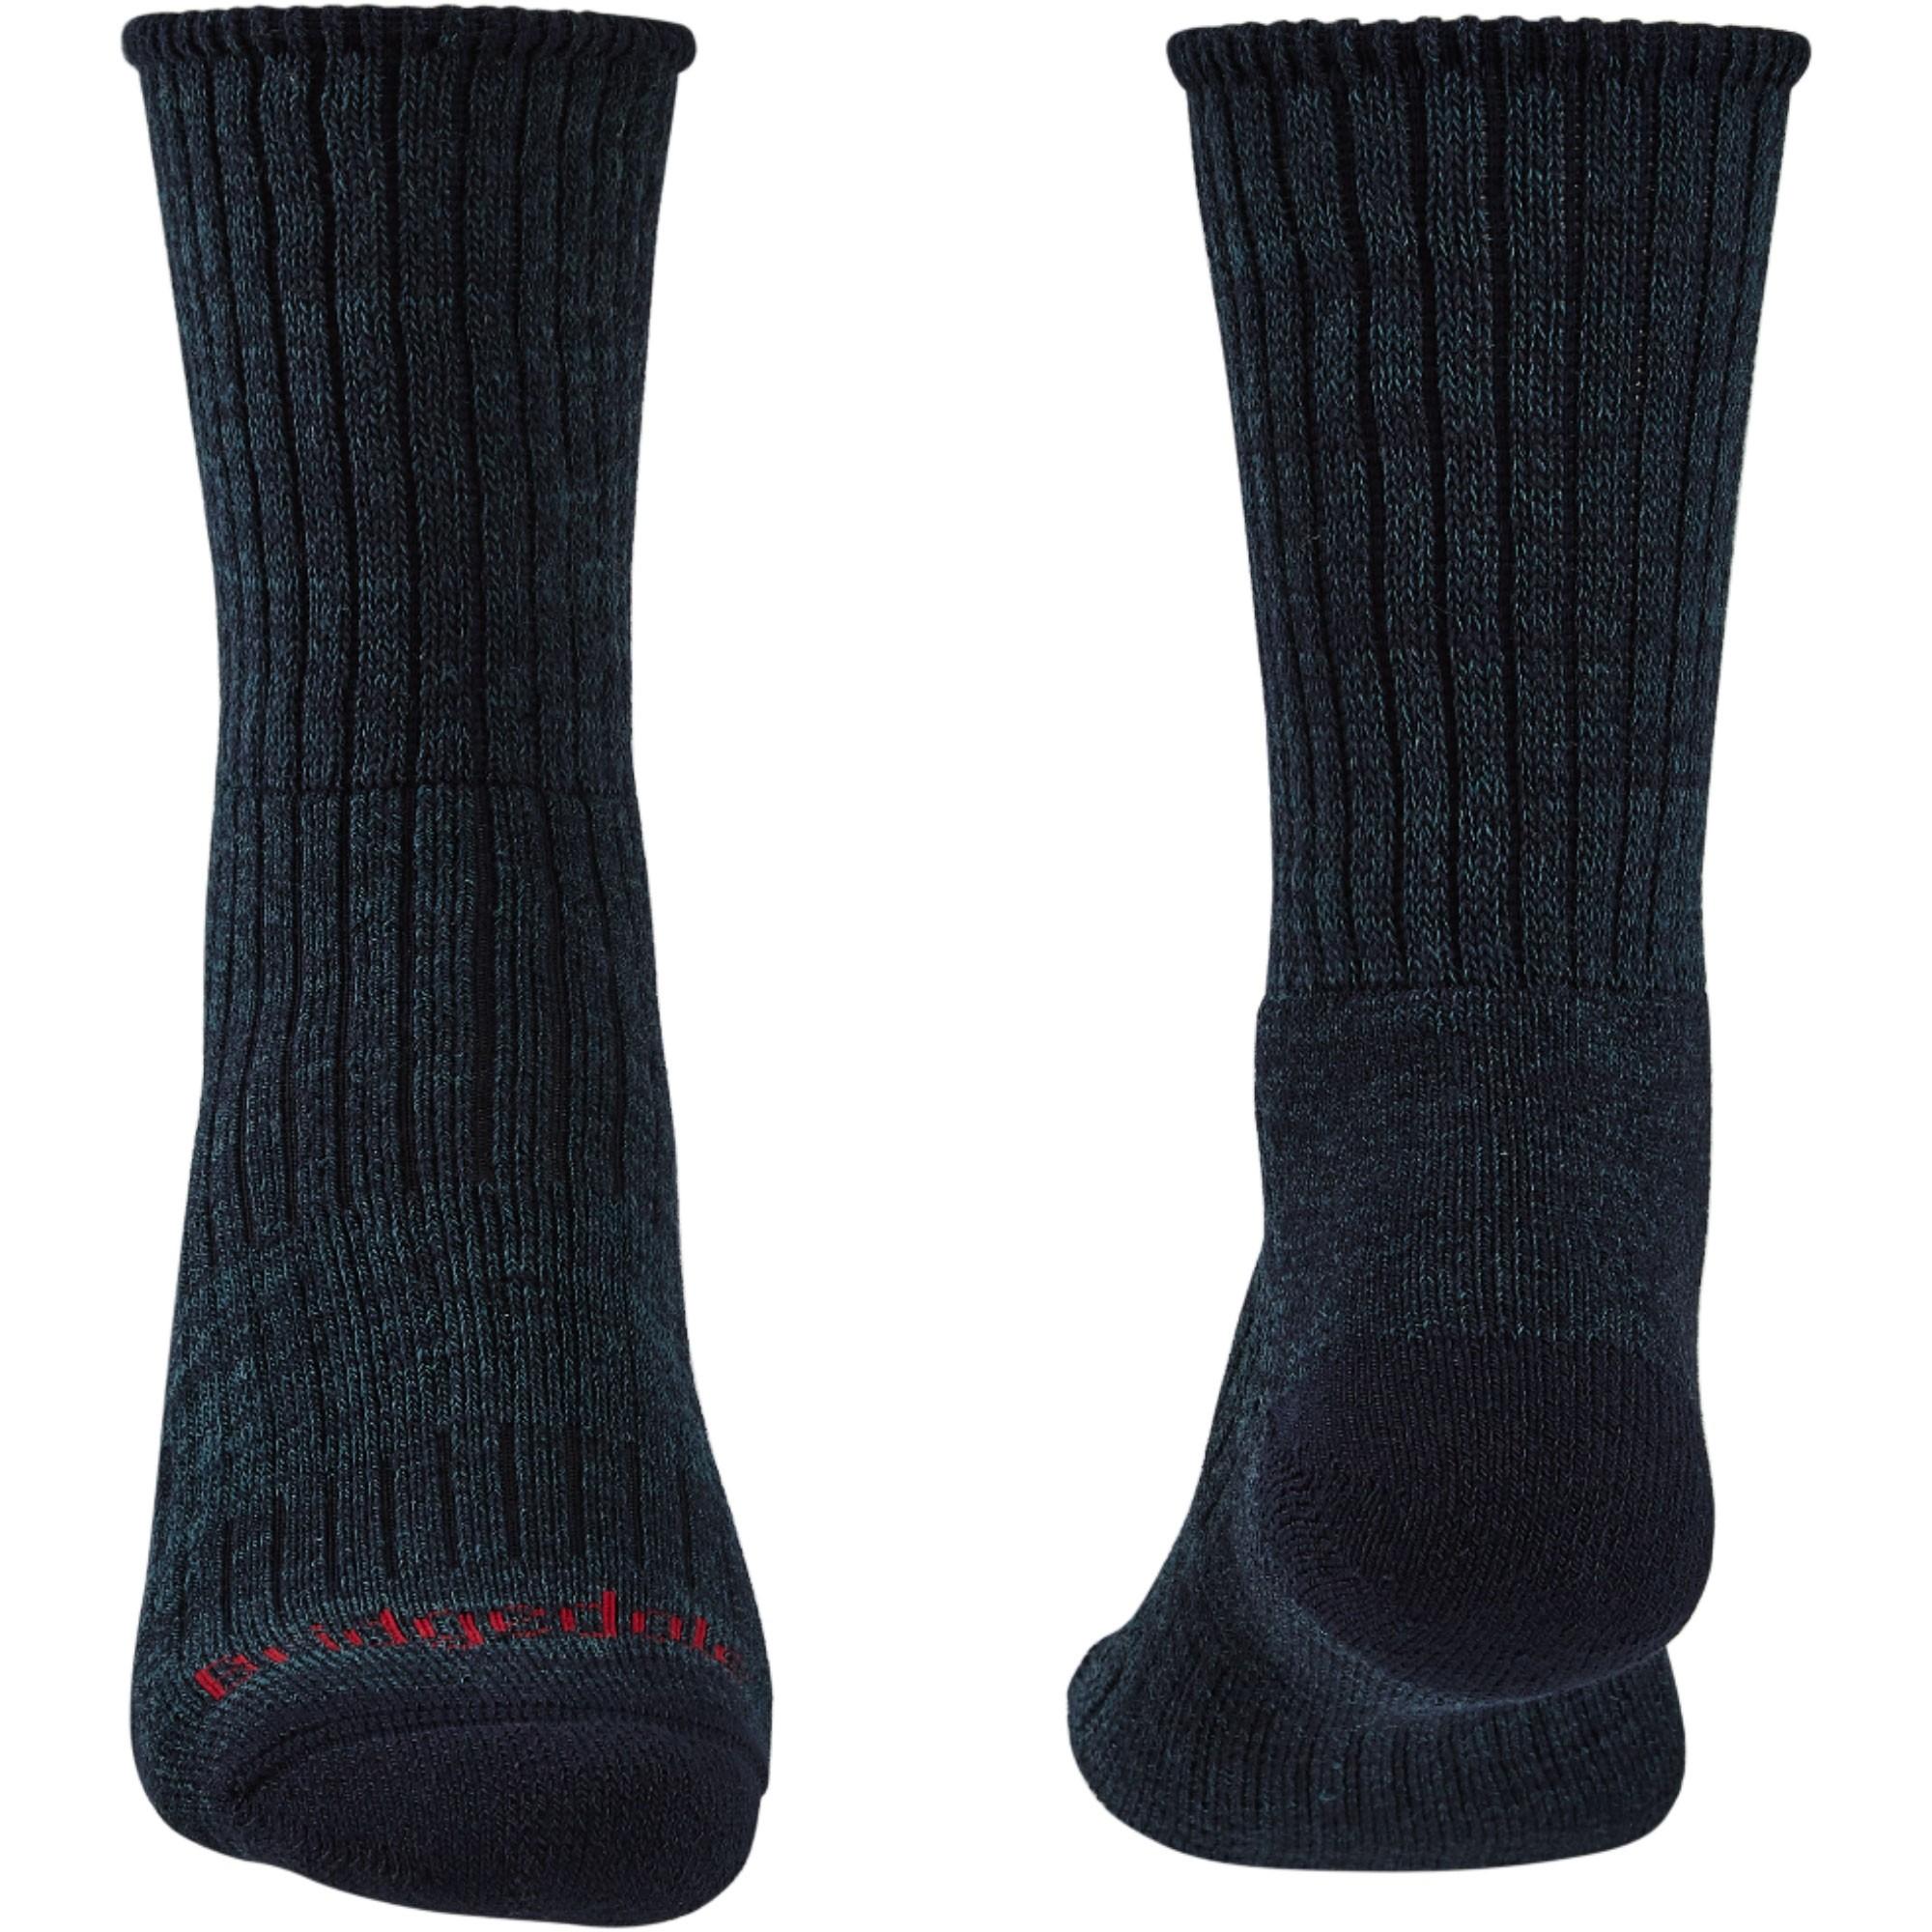 Bridgedale Hike Midweight Merino Comfort Men's Socks - Navy